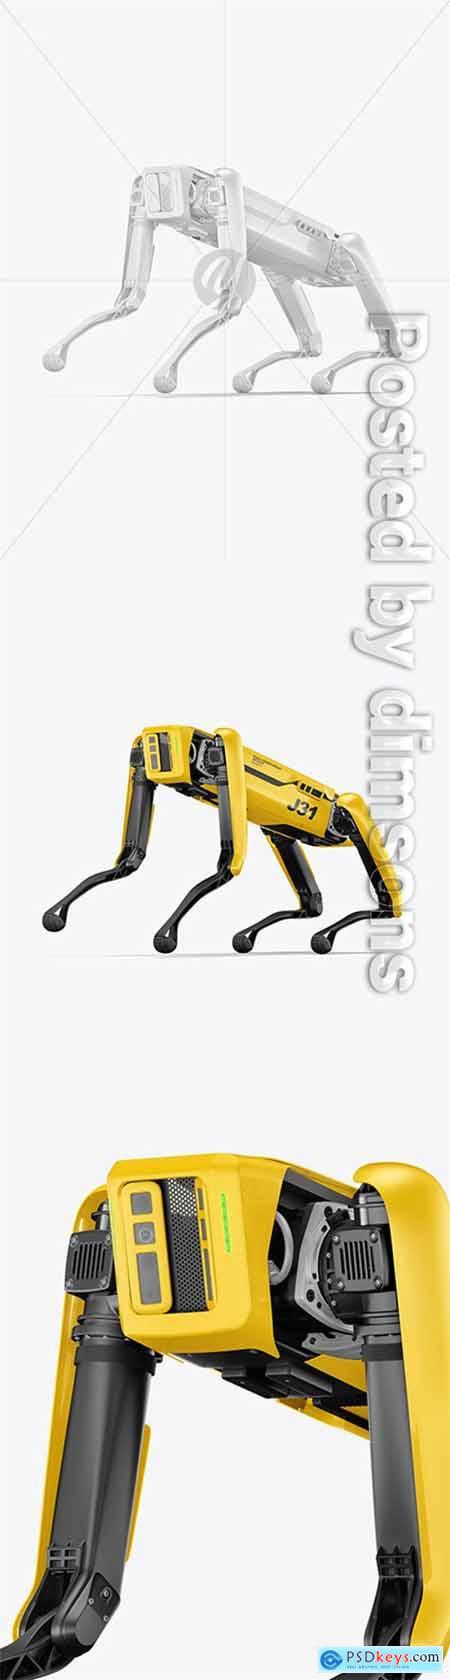 Four-Legged Robot Mockup 66151